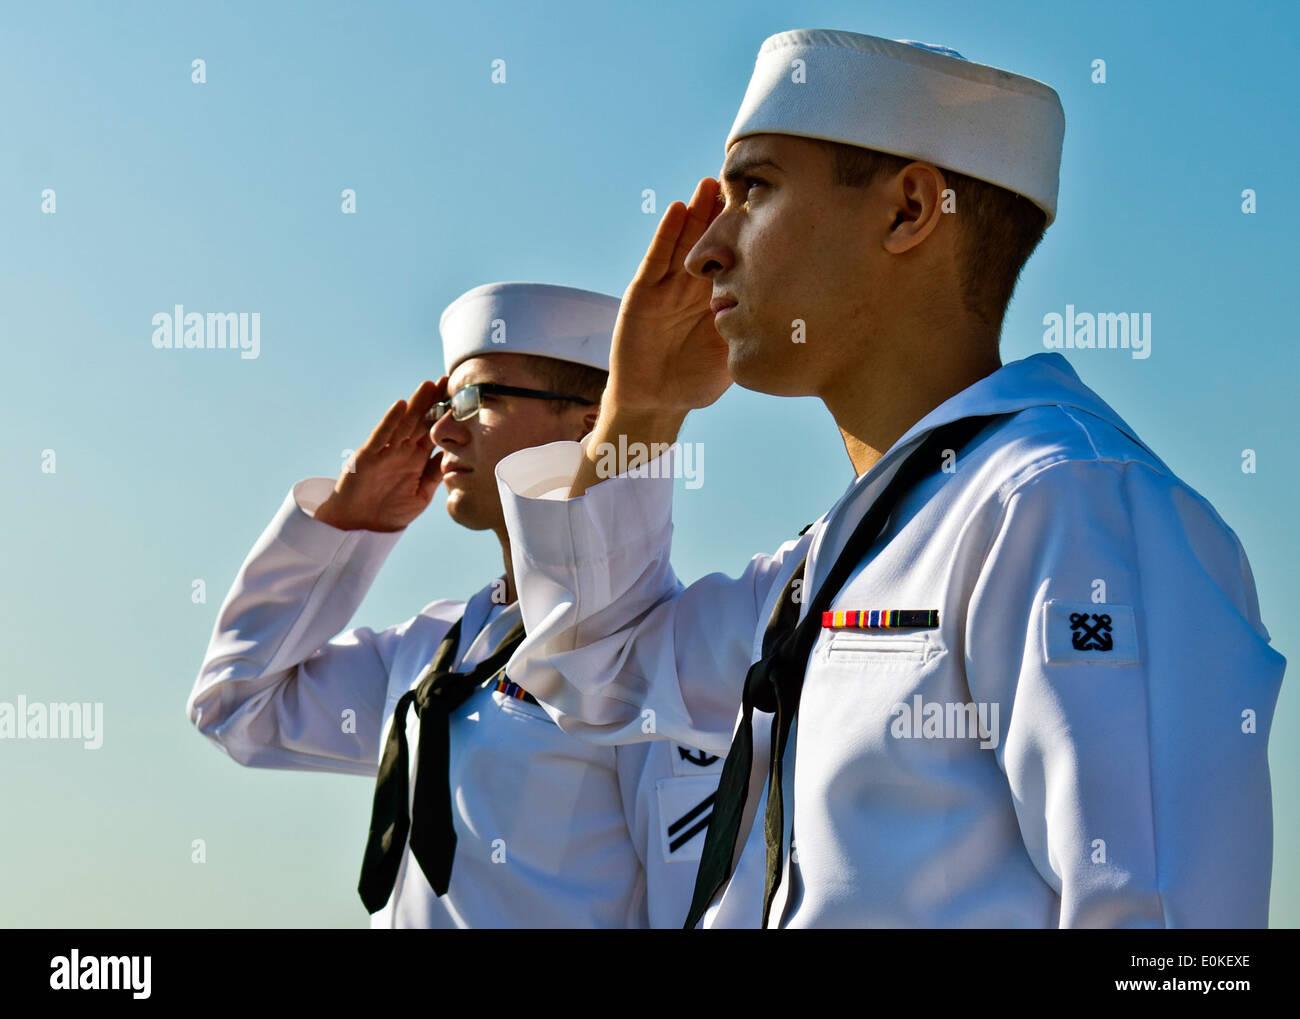 130405-N-IY633-015 MANILA, Philippines (April 5, 2013) – Seaman Matthew Voorting, left, and Boatswain's Mate Seaman Stephen - Stock Image